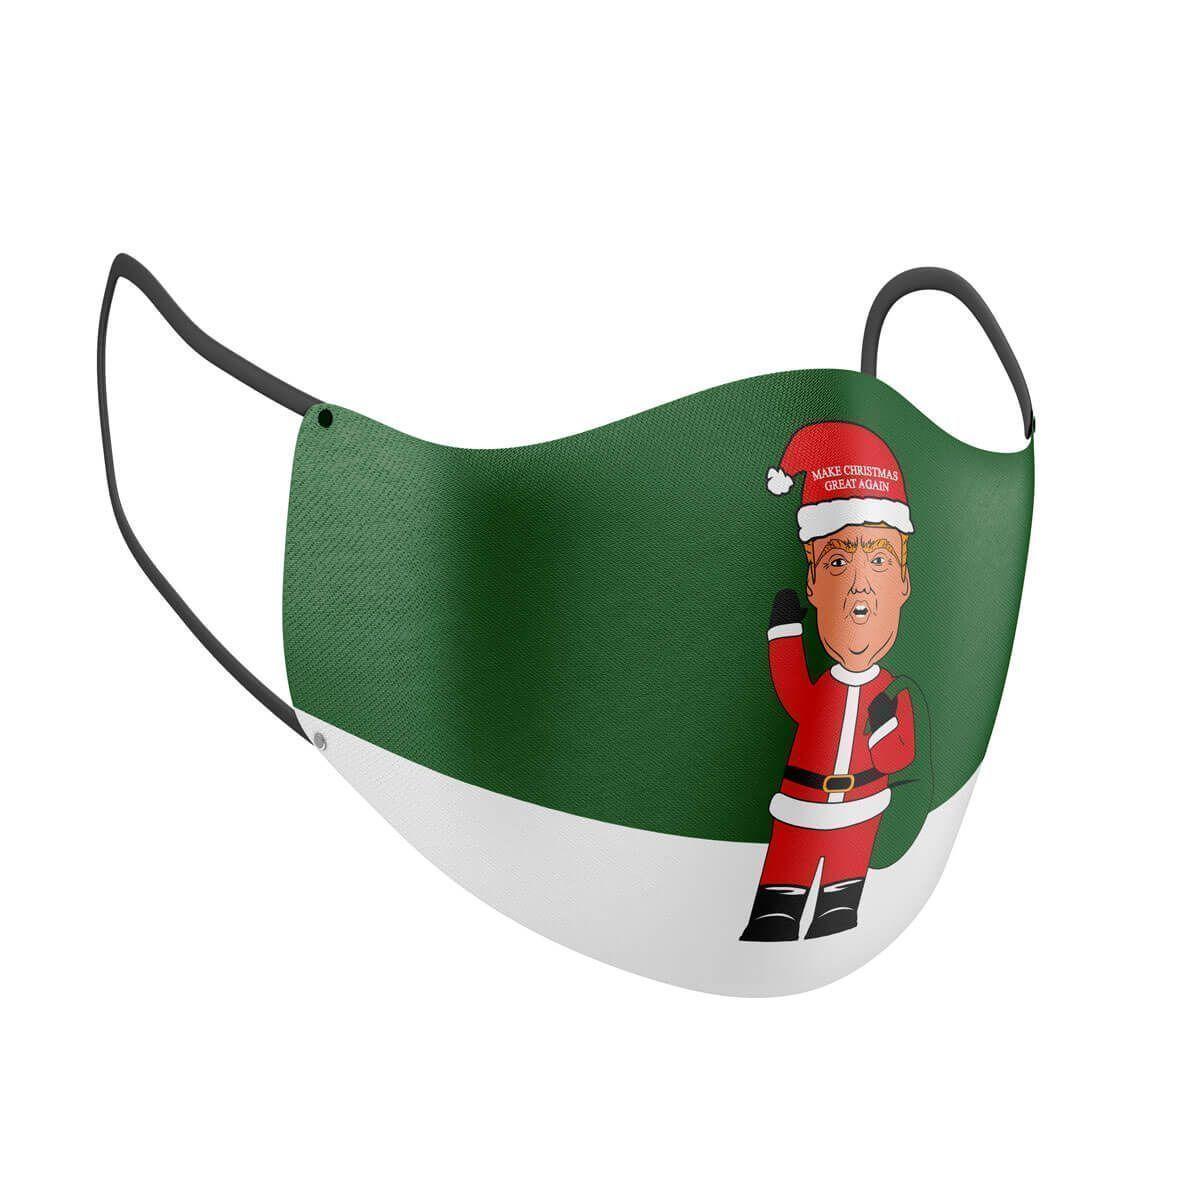 😷Why wait till Christmas? AD https://t.co/IOCg1oNxhC   #facemasks #trump #merrychristmas https://t.co/MR2FFFUUSJ